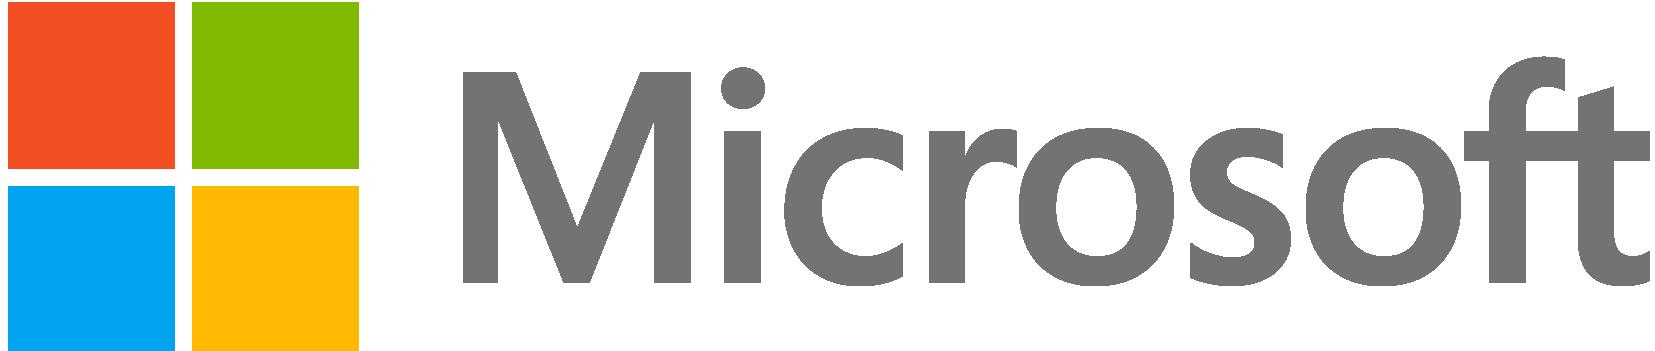 Microsoft - ICCP 2016 Silver Level Sponsor